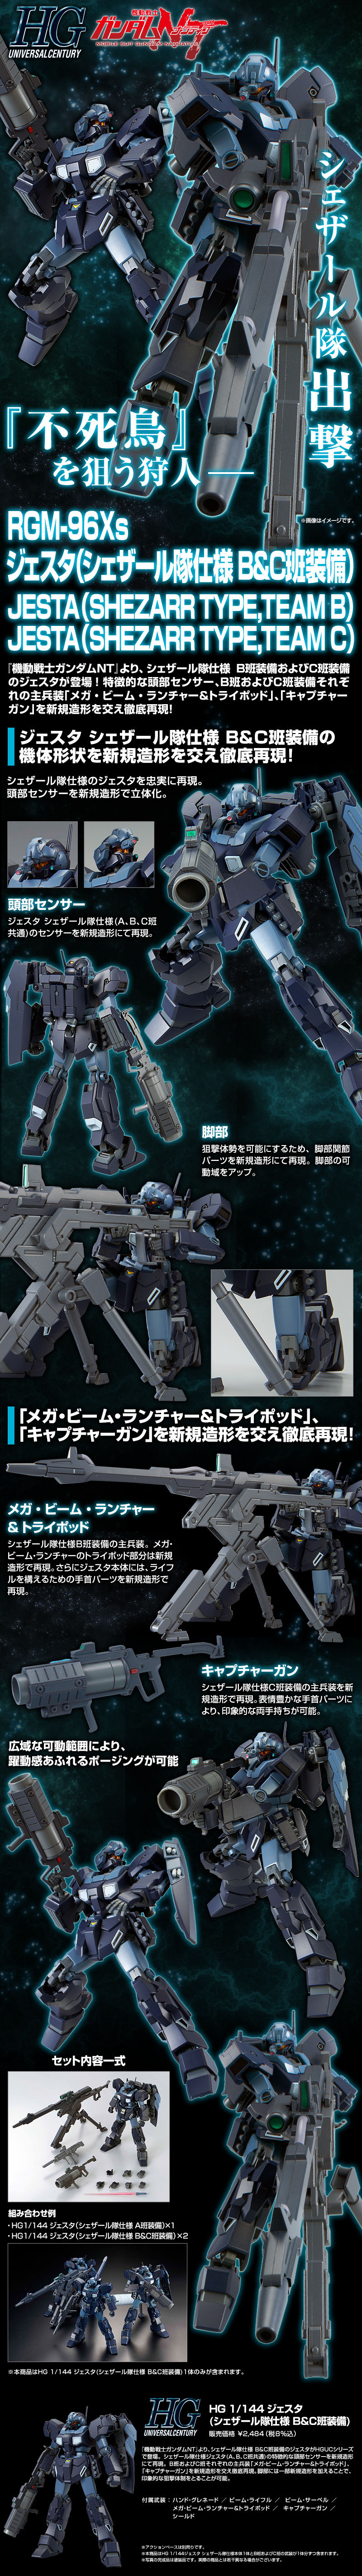 HGUC 1/144 RGM-96X ジェスタ (シェザール隊仕様 B&C班装備) 公式商品説明(画像)